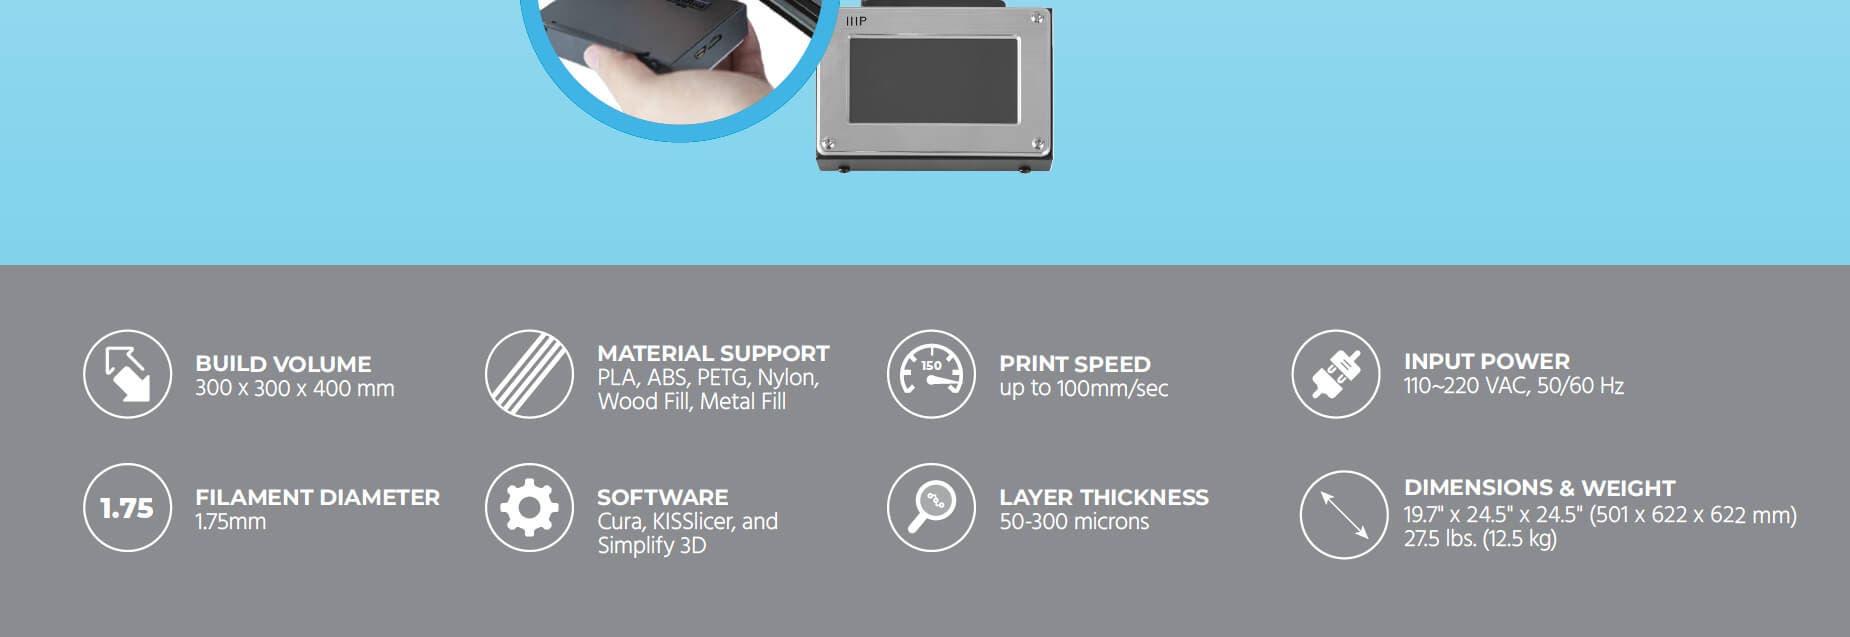 MP10 3D Printer